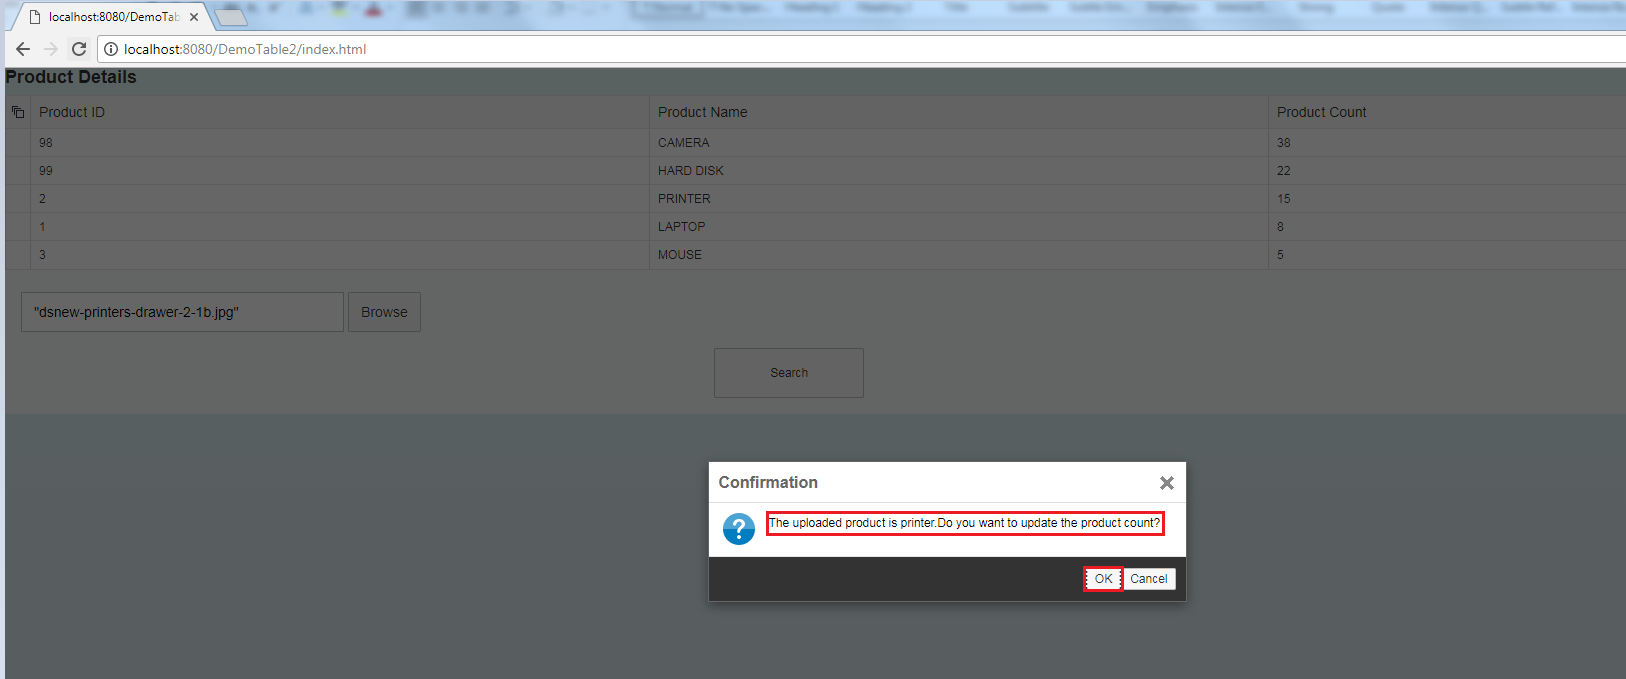 Evaluating SAP Leonardo Machine Learning image classification API